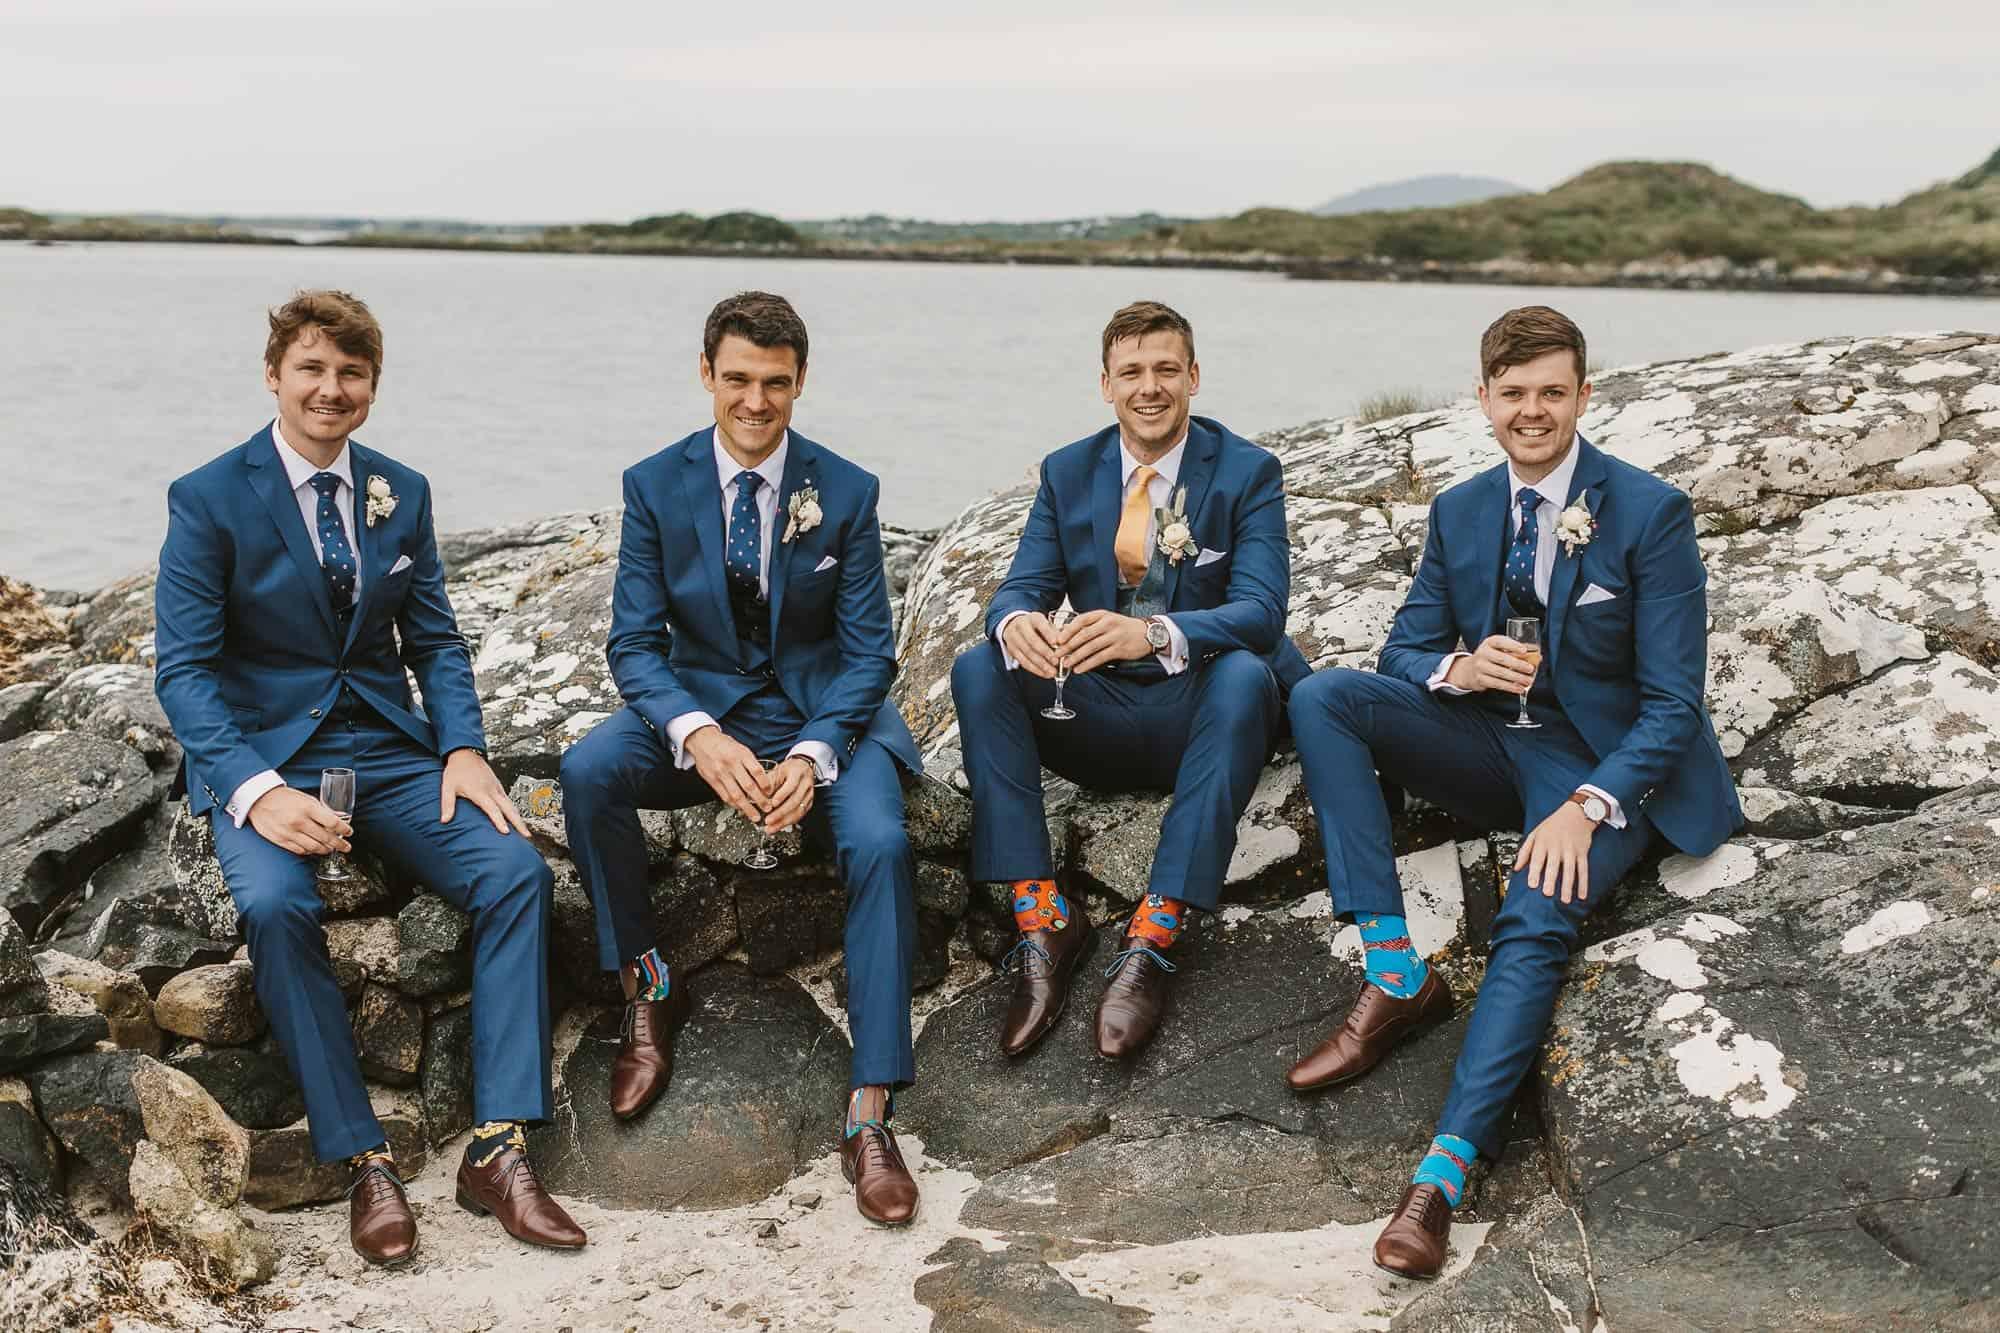 Elopement Ireland Connemara Groomsmen Style as they sit on the rocks